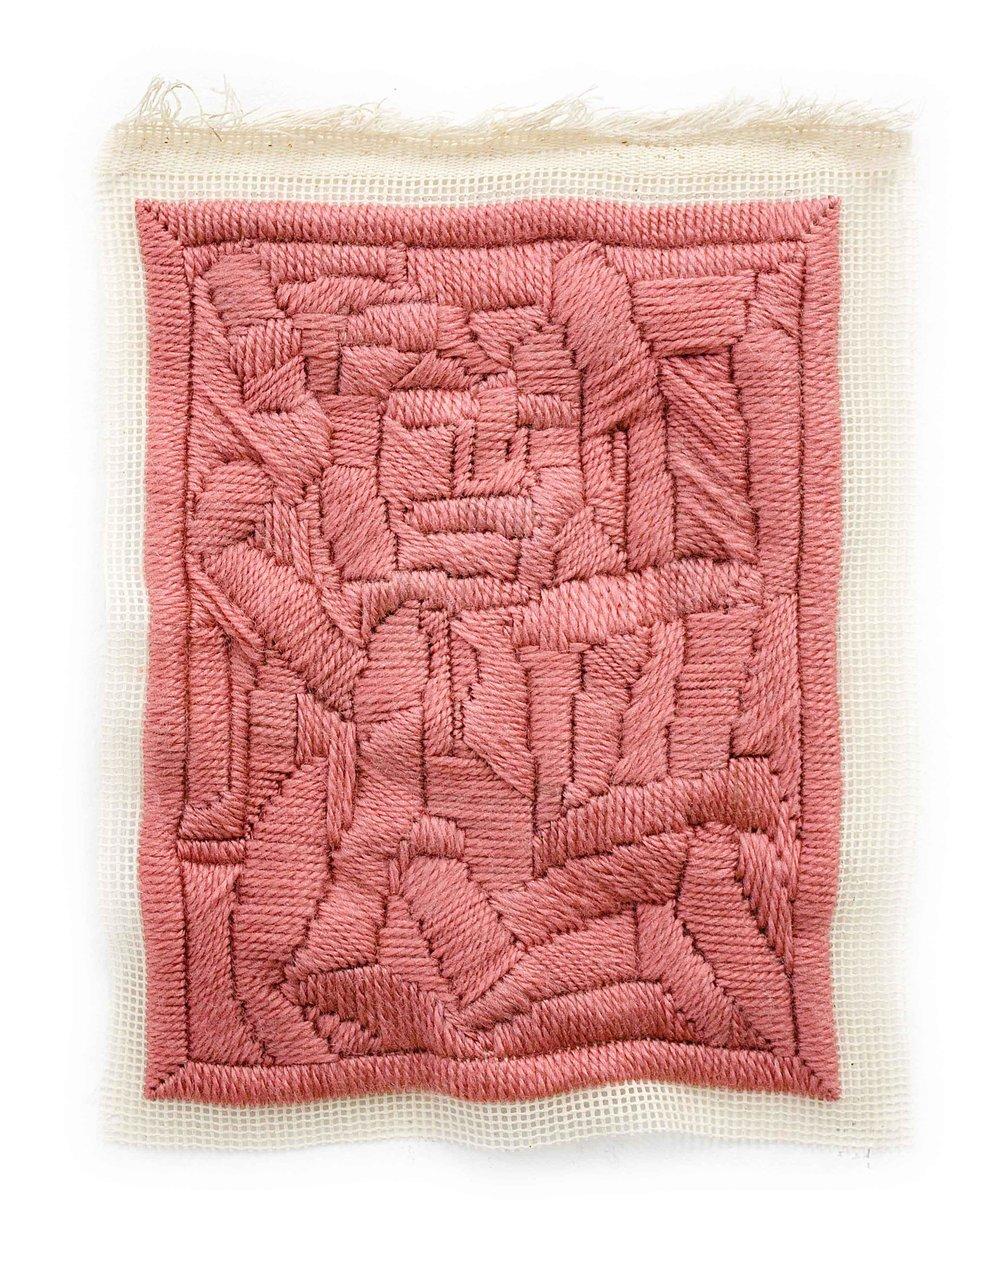 """Carlier"", 2016, wool tapestry, 25 x 20 cm"